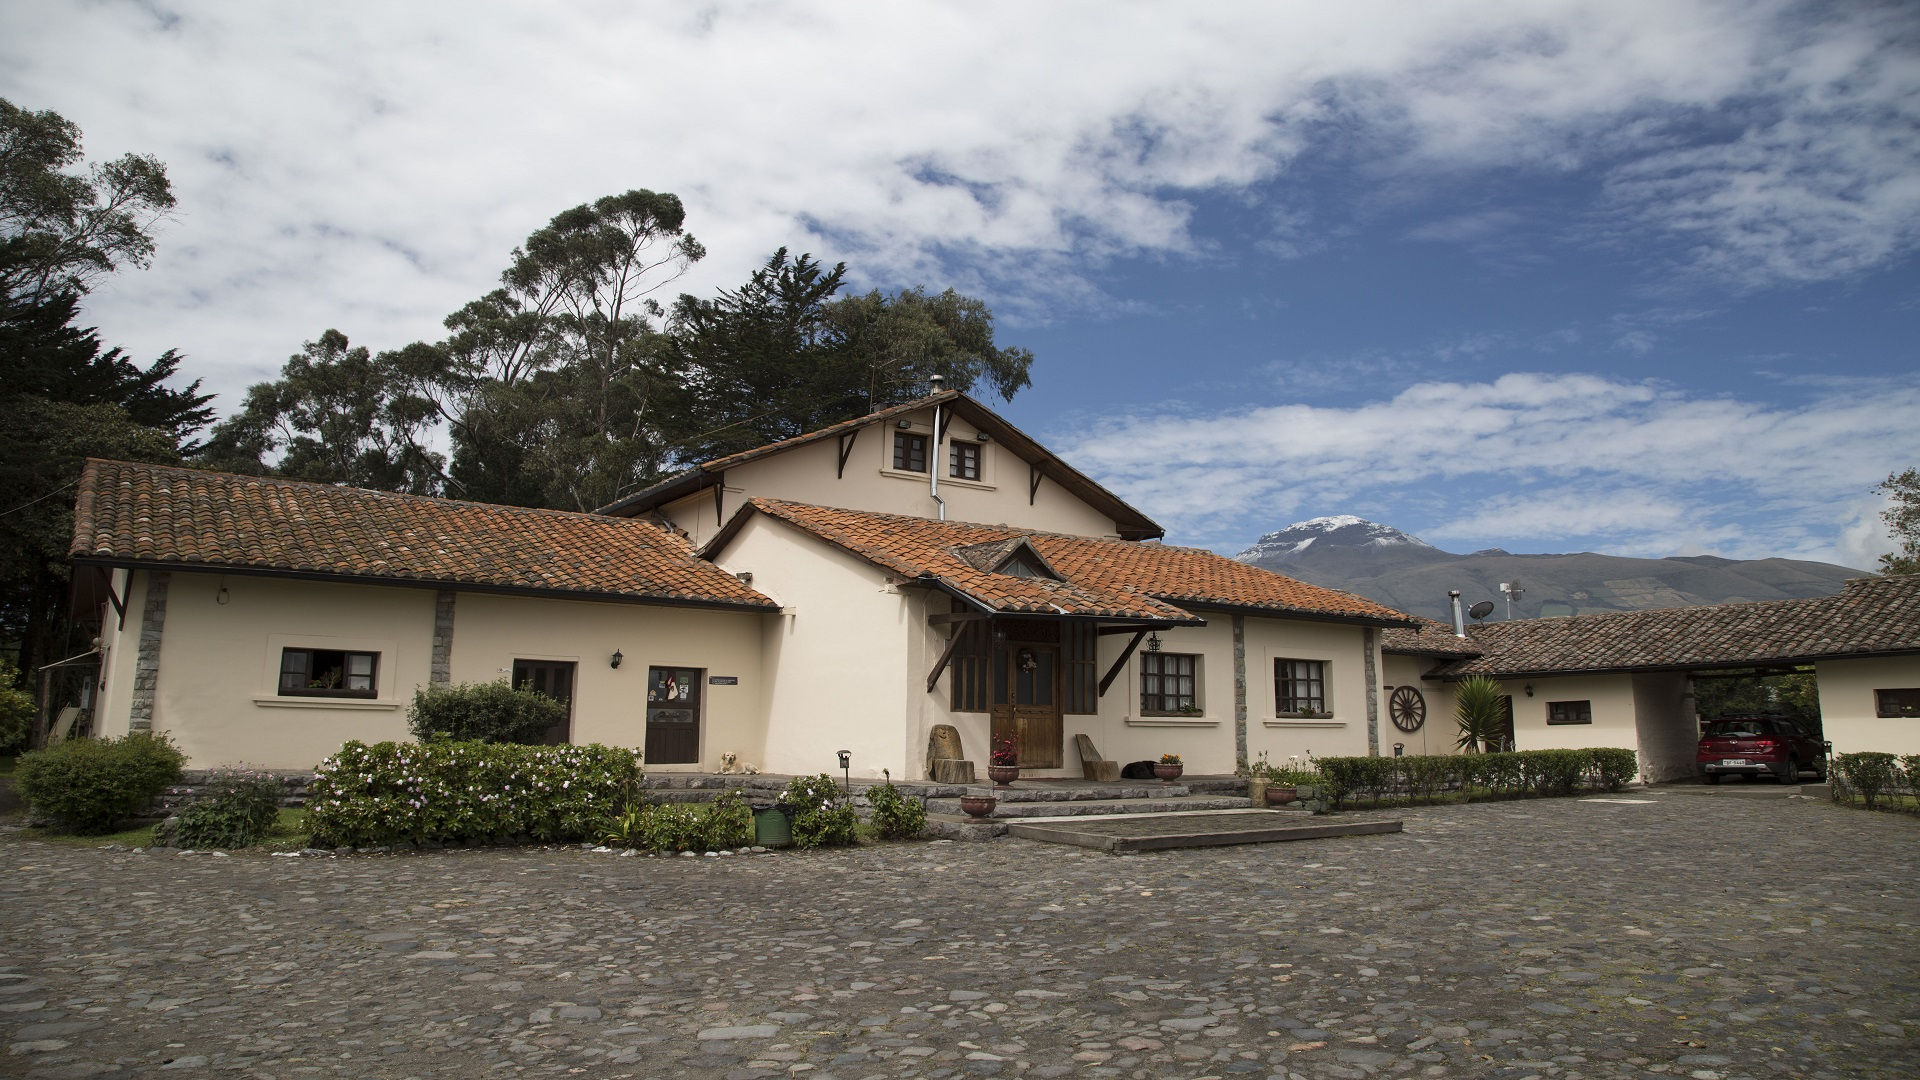 hosterias ecuador, machachi hosteria, ecuador tours, cotopaxi, tour cabalgata ecuador, tour bicicleta ecuador